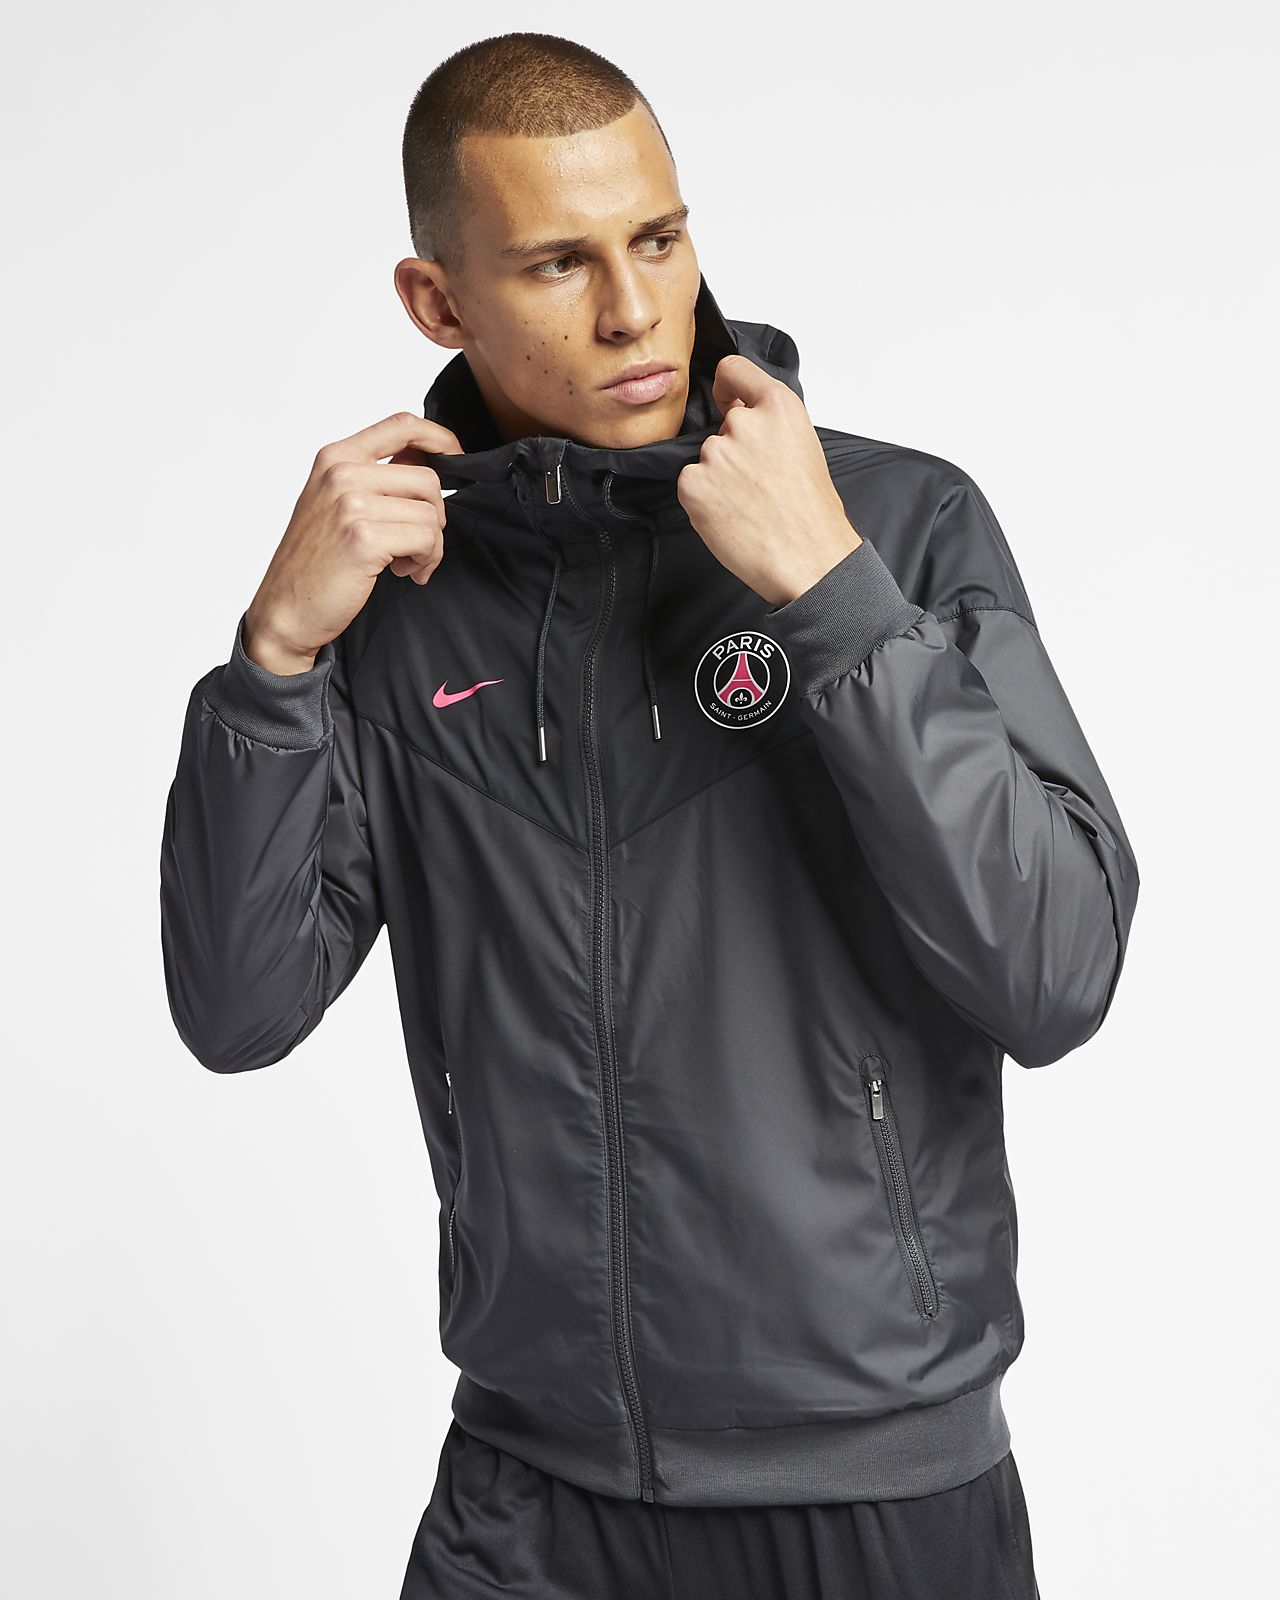 d9b753755dd366 Paris Saint-Germain Windrunner Men s Jacket. Nike.com CZ